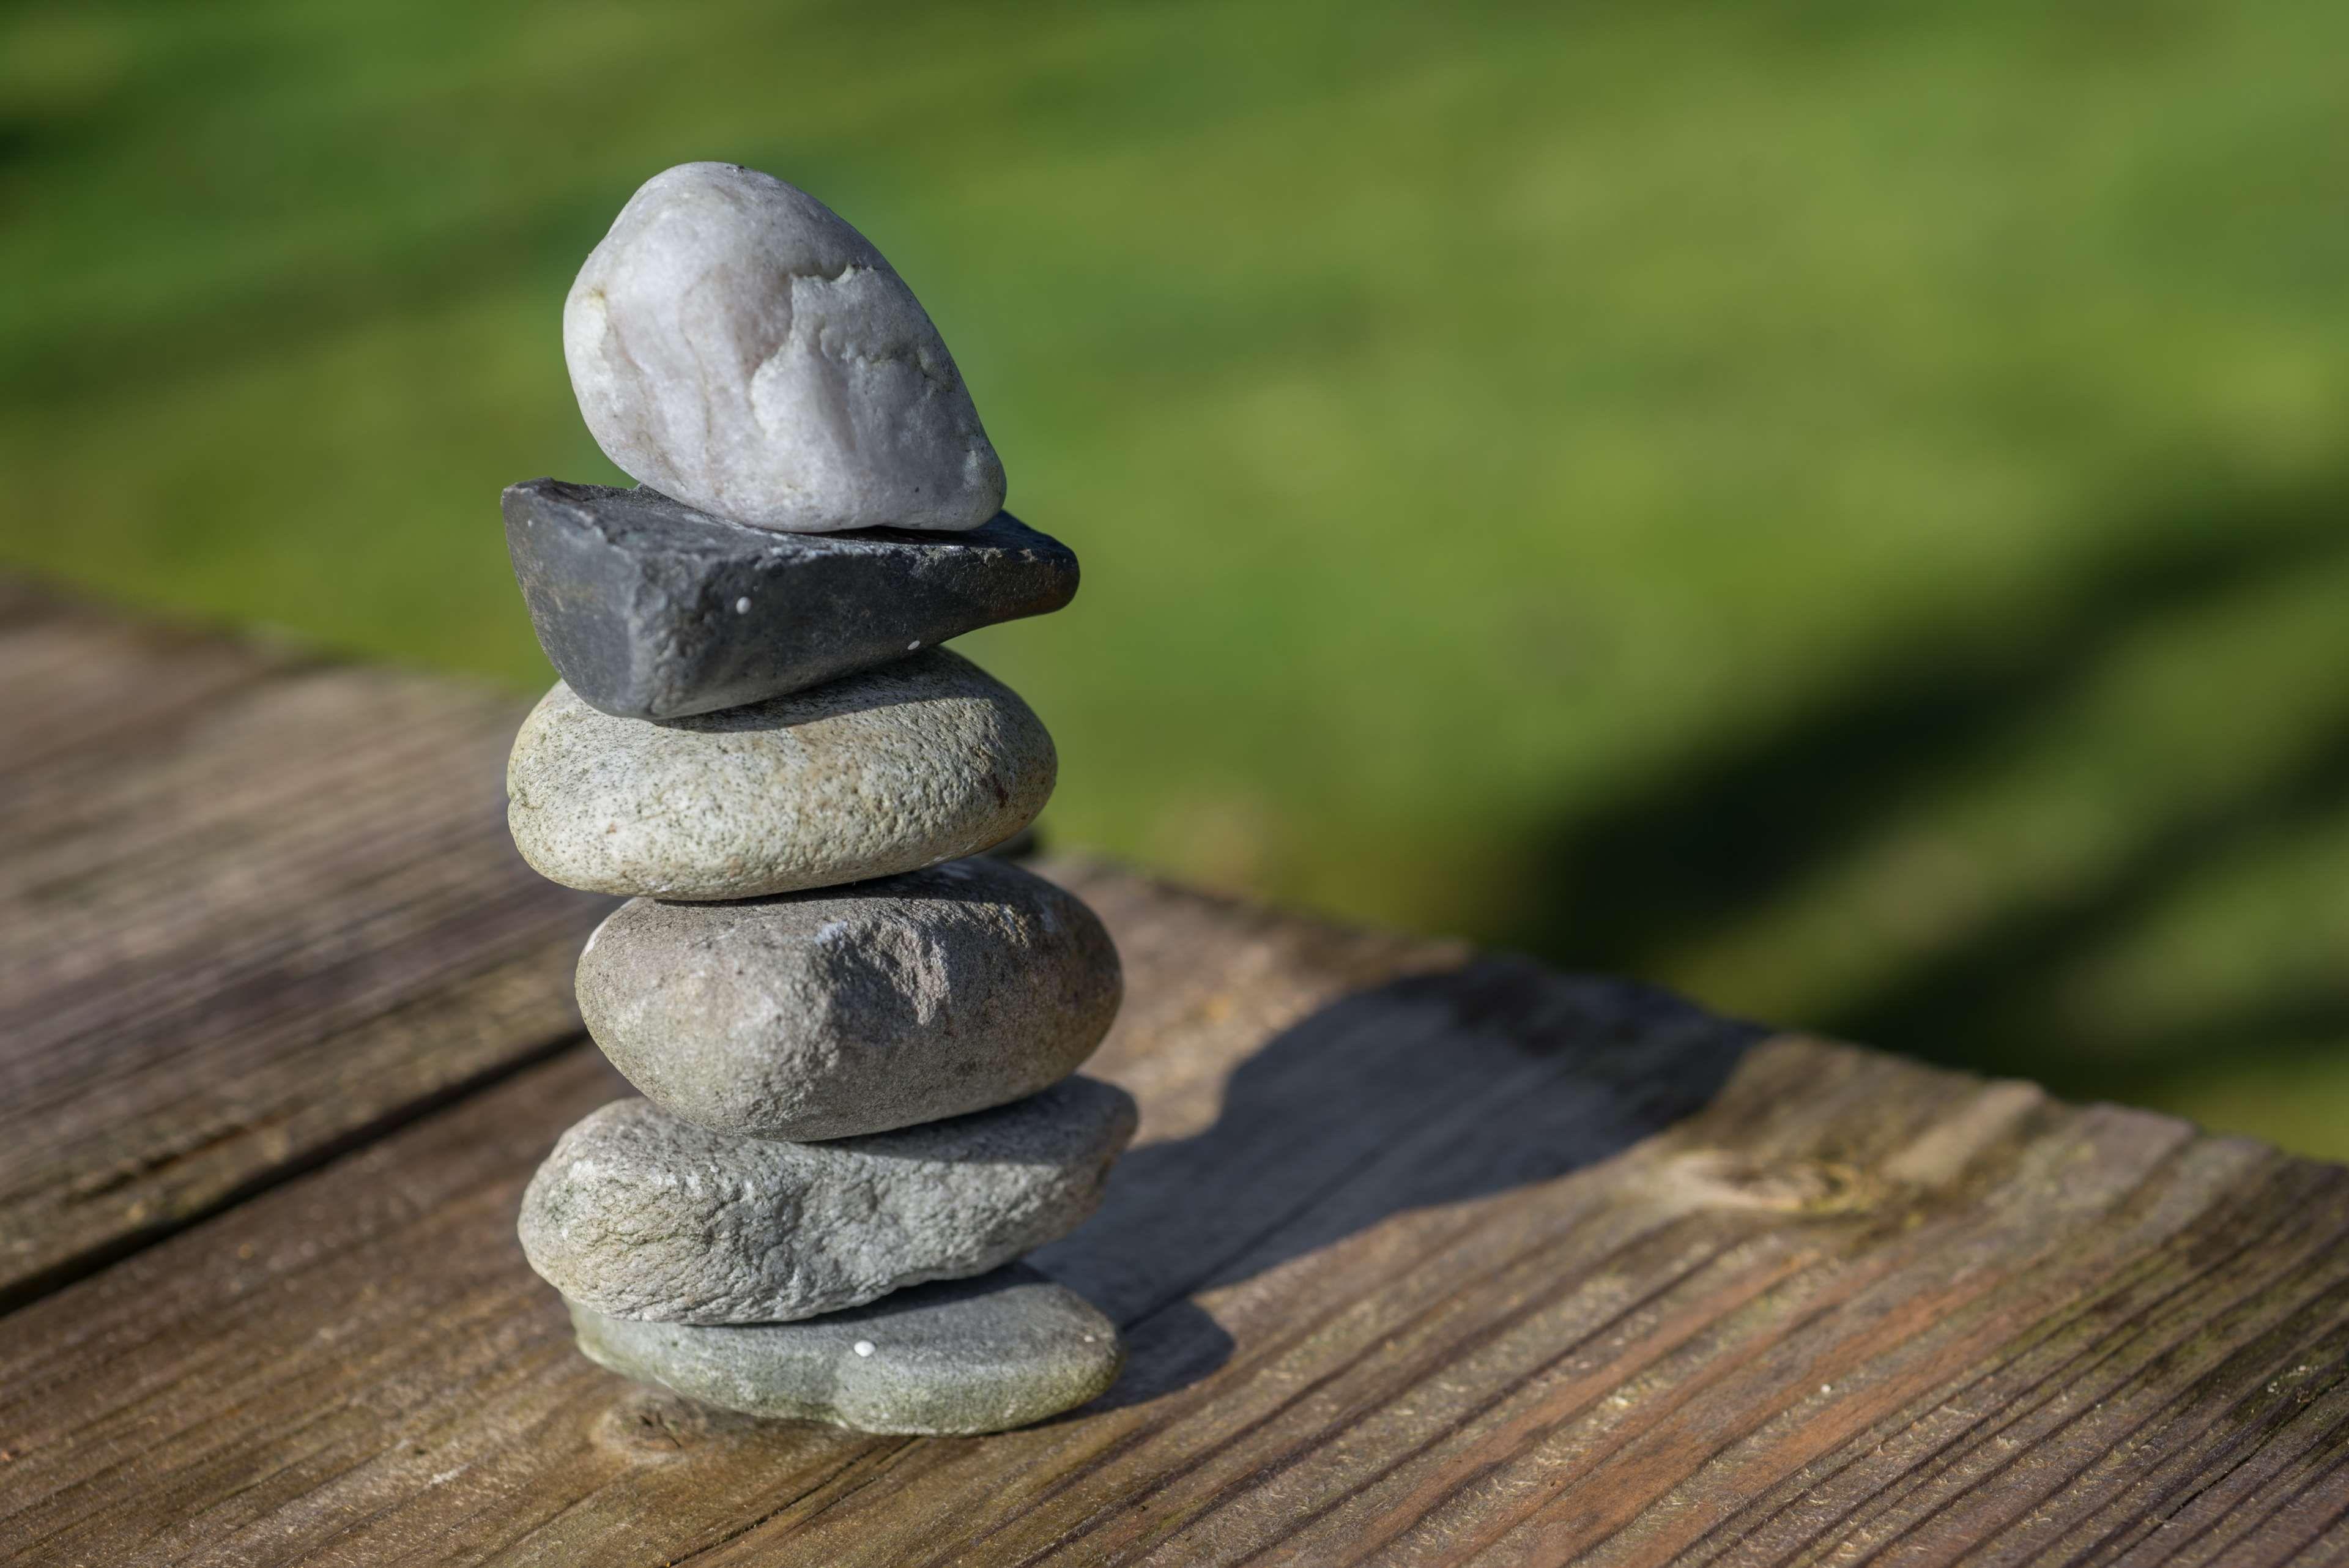 balance #decoration #garden #hard #harmony #natural #nature #outdoor ...